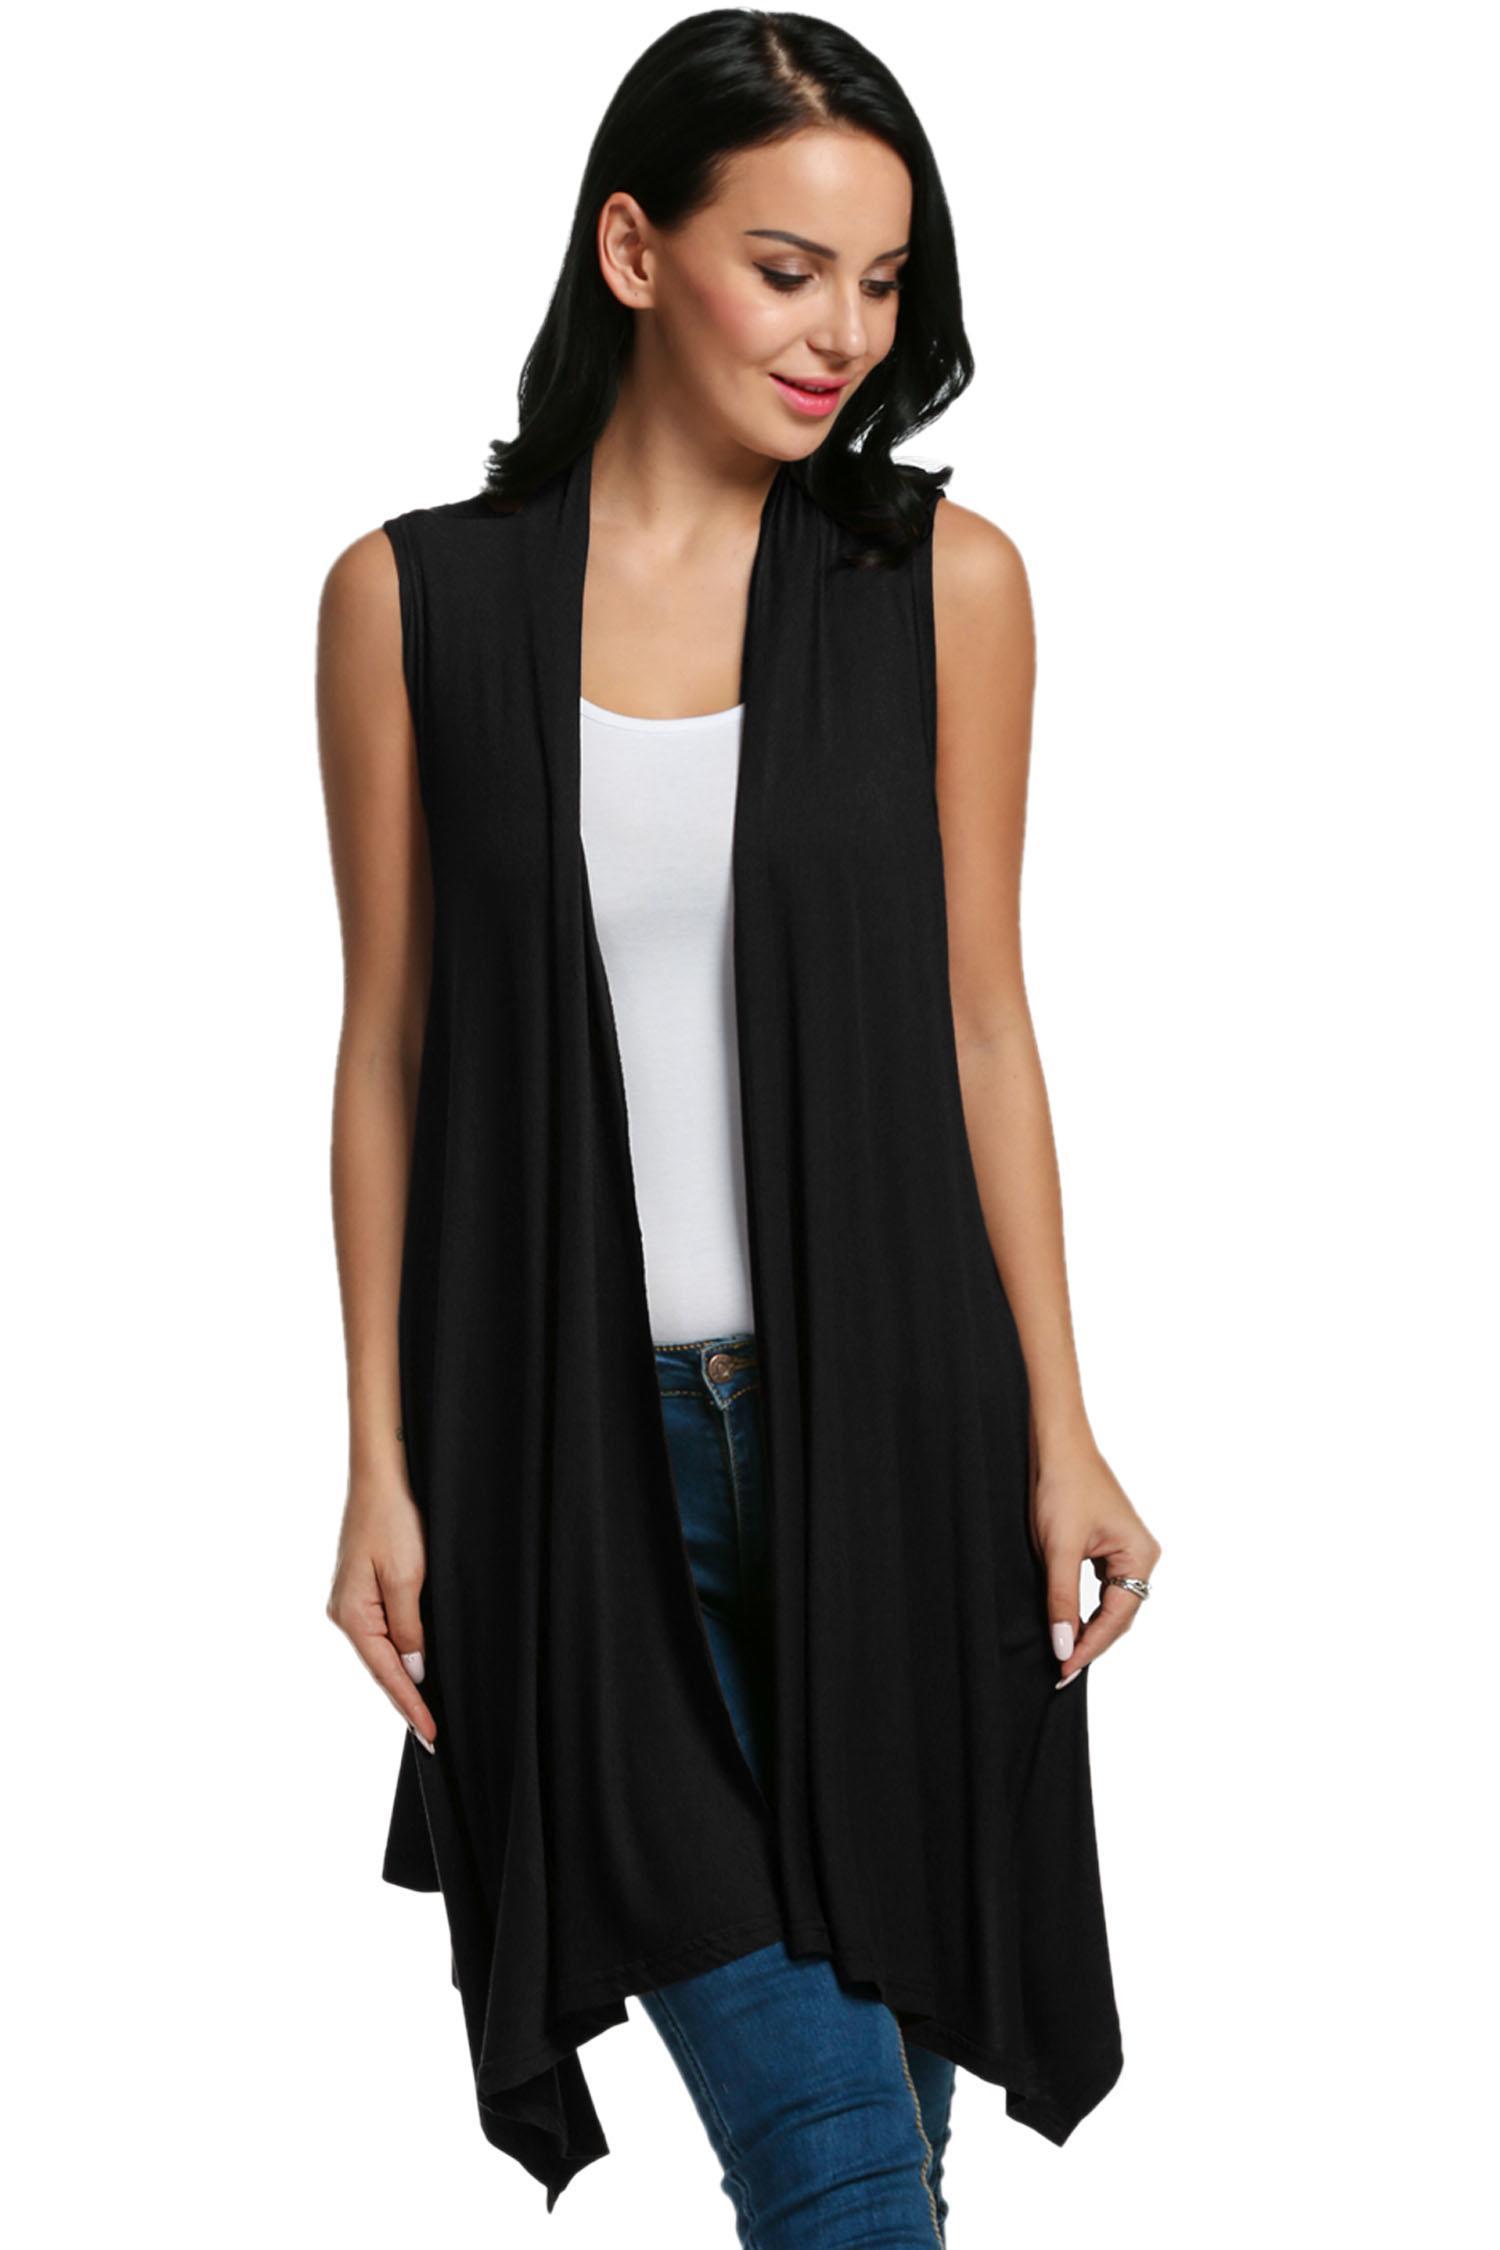 cc600f018 Meaneor Black Women's Sleeveless & Blazers | cndirect.com